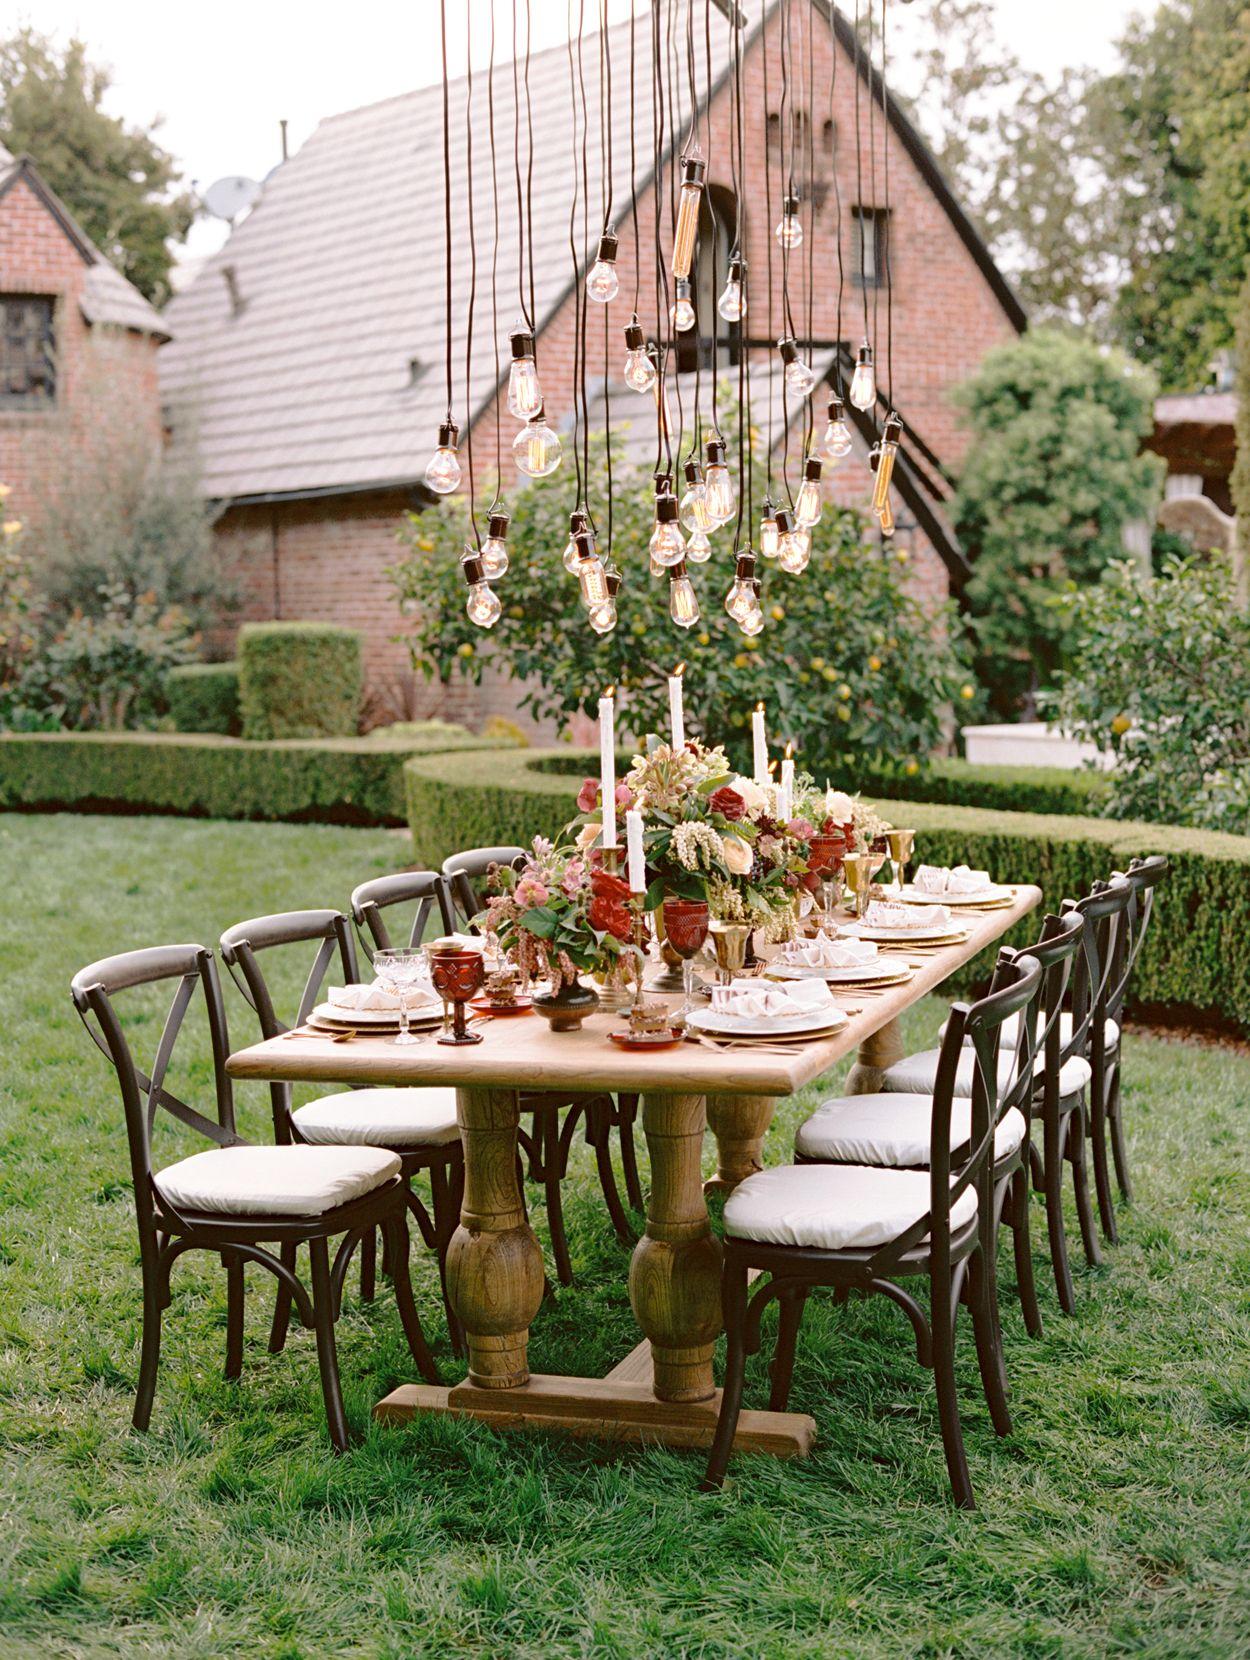 elegant decorations wedding table lights. Photography : Marisa Holmes Read More On SMP: Http://www.stylemepretty.com/2014/10/17/elegant-estate-wedding -inspiration-part-2/ Elegant Decorations Wedding Table Lights D